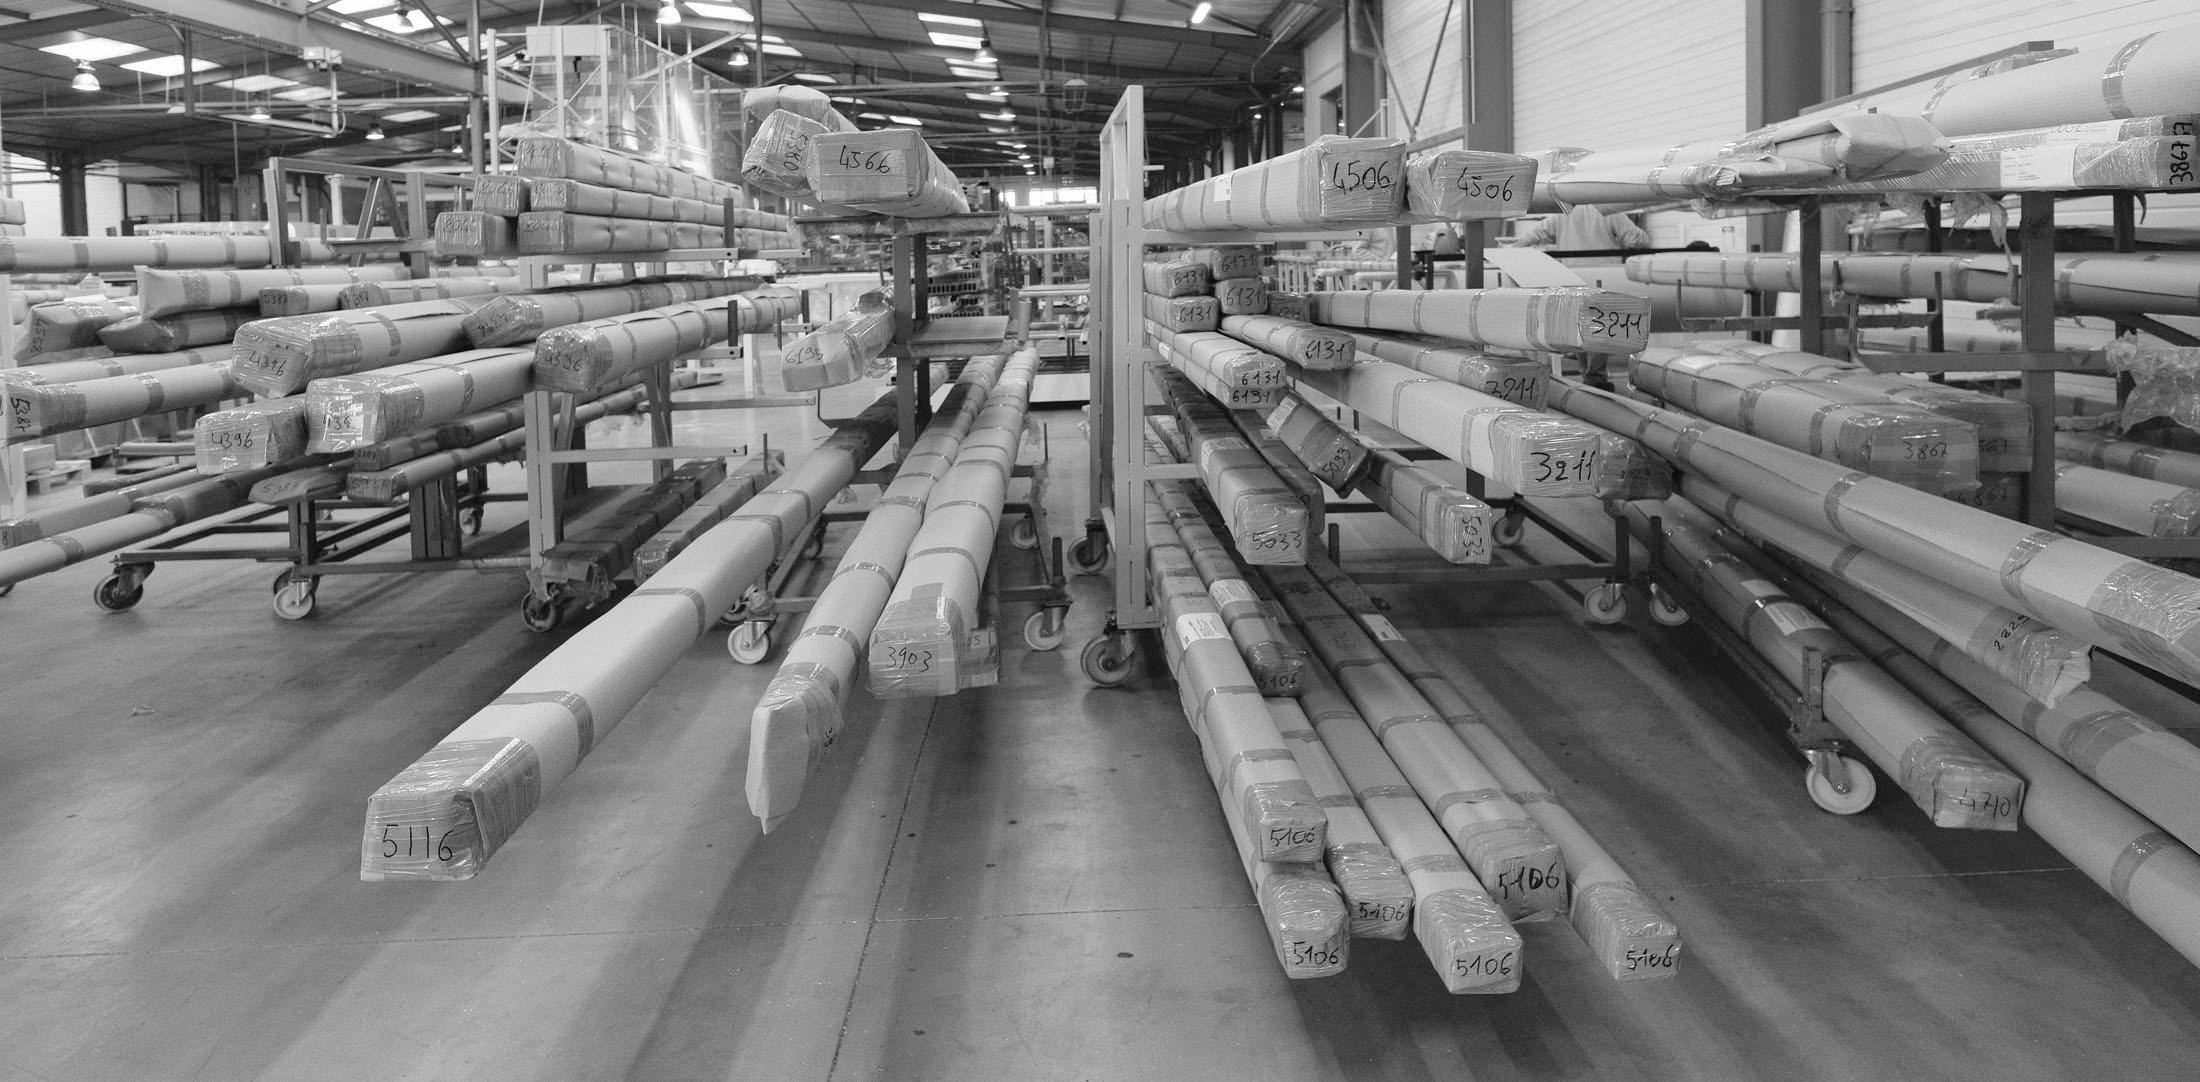 Reportage, photo du stock industriel